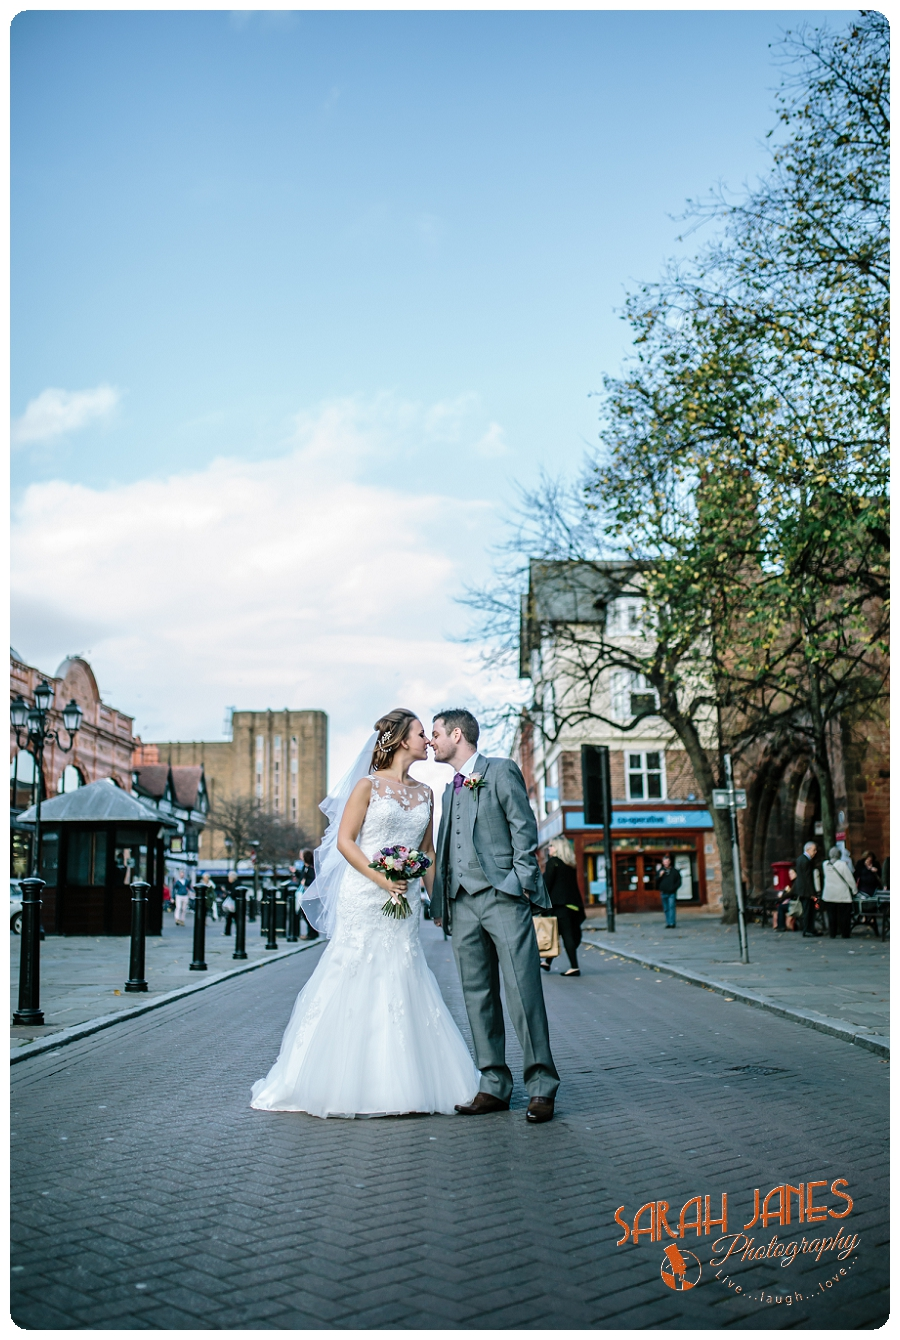 Wedding photography Chester, Weddings Rowton Hall, Wedding photography at Rowton Hall, Sarah Janes Photograpphy_0024.jpg